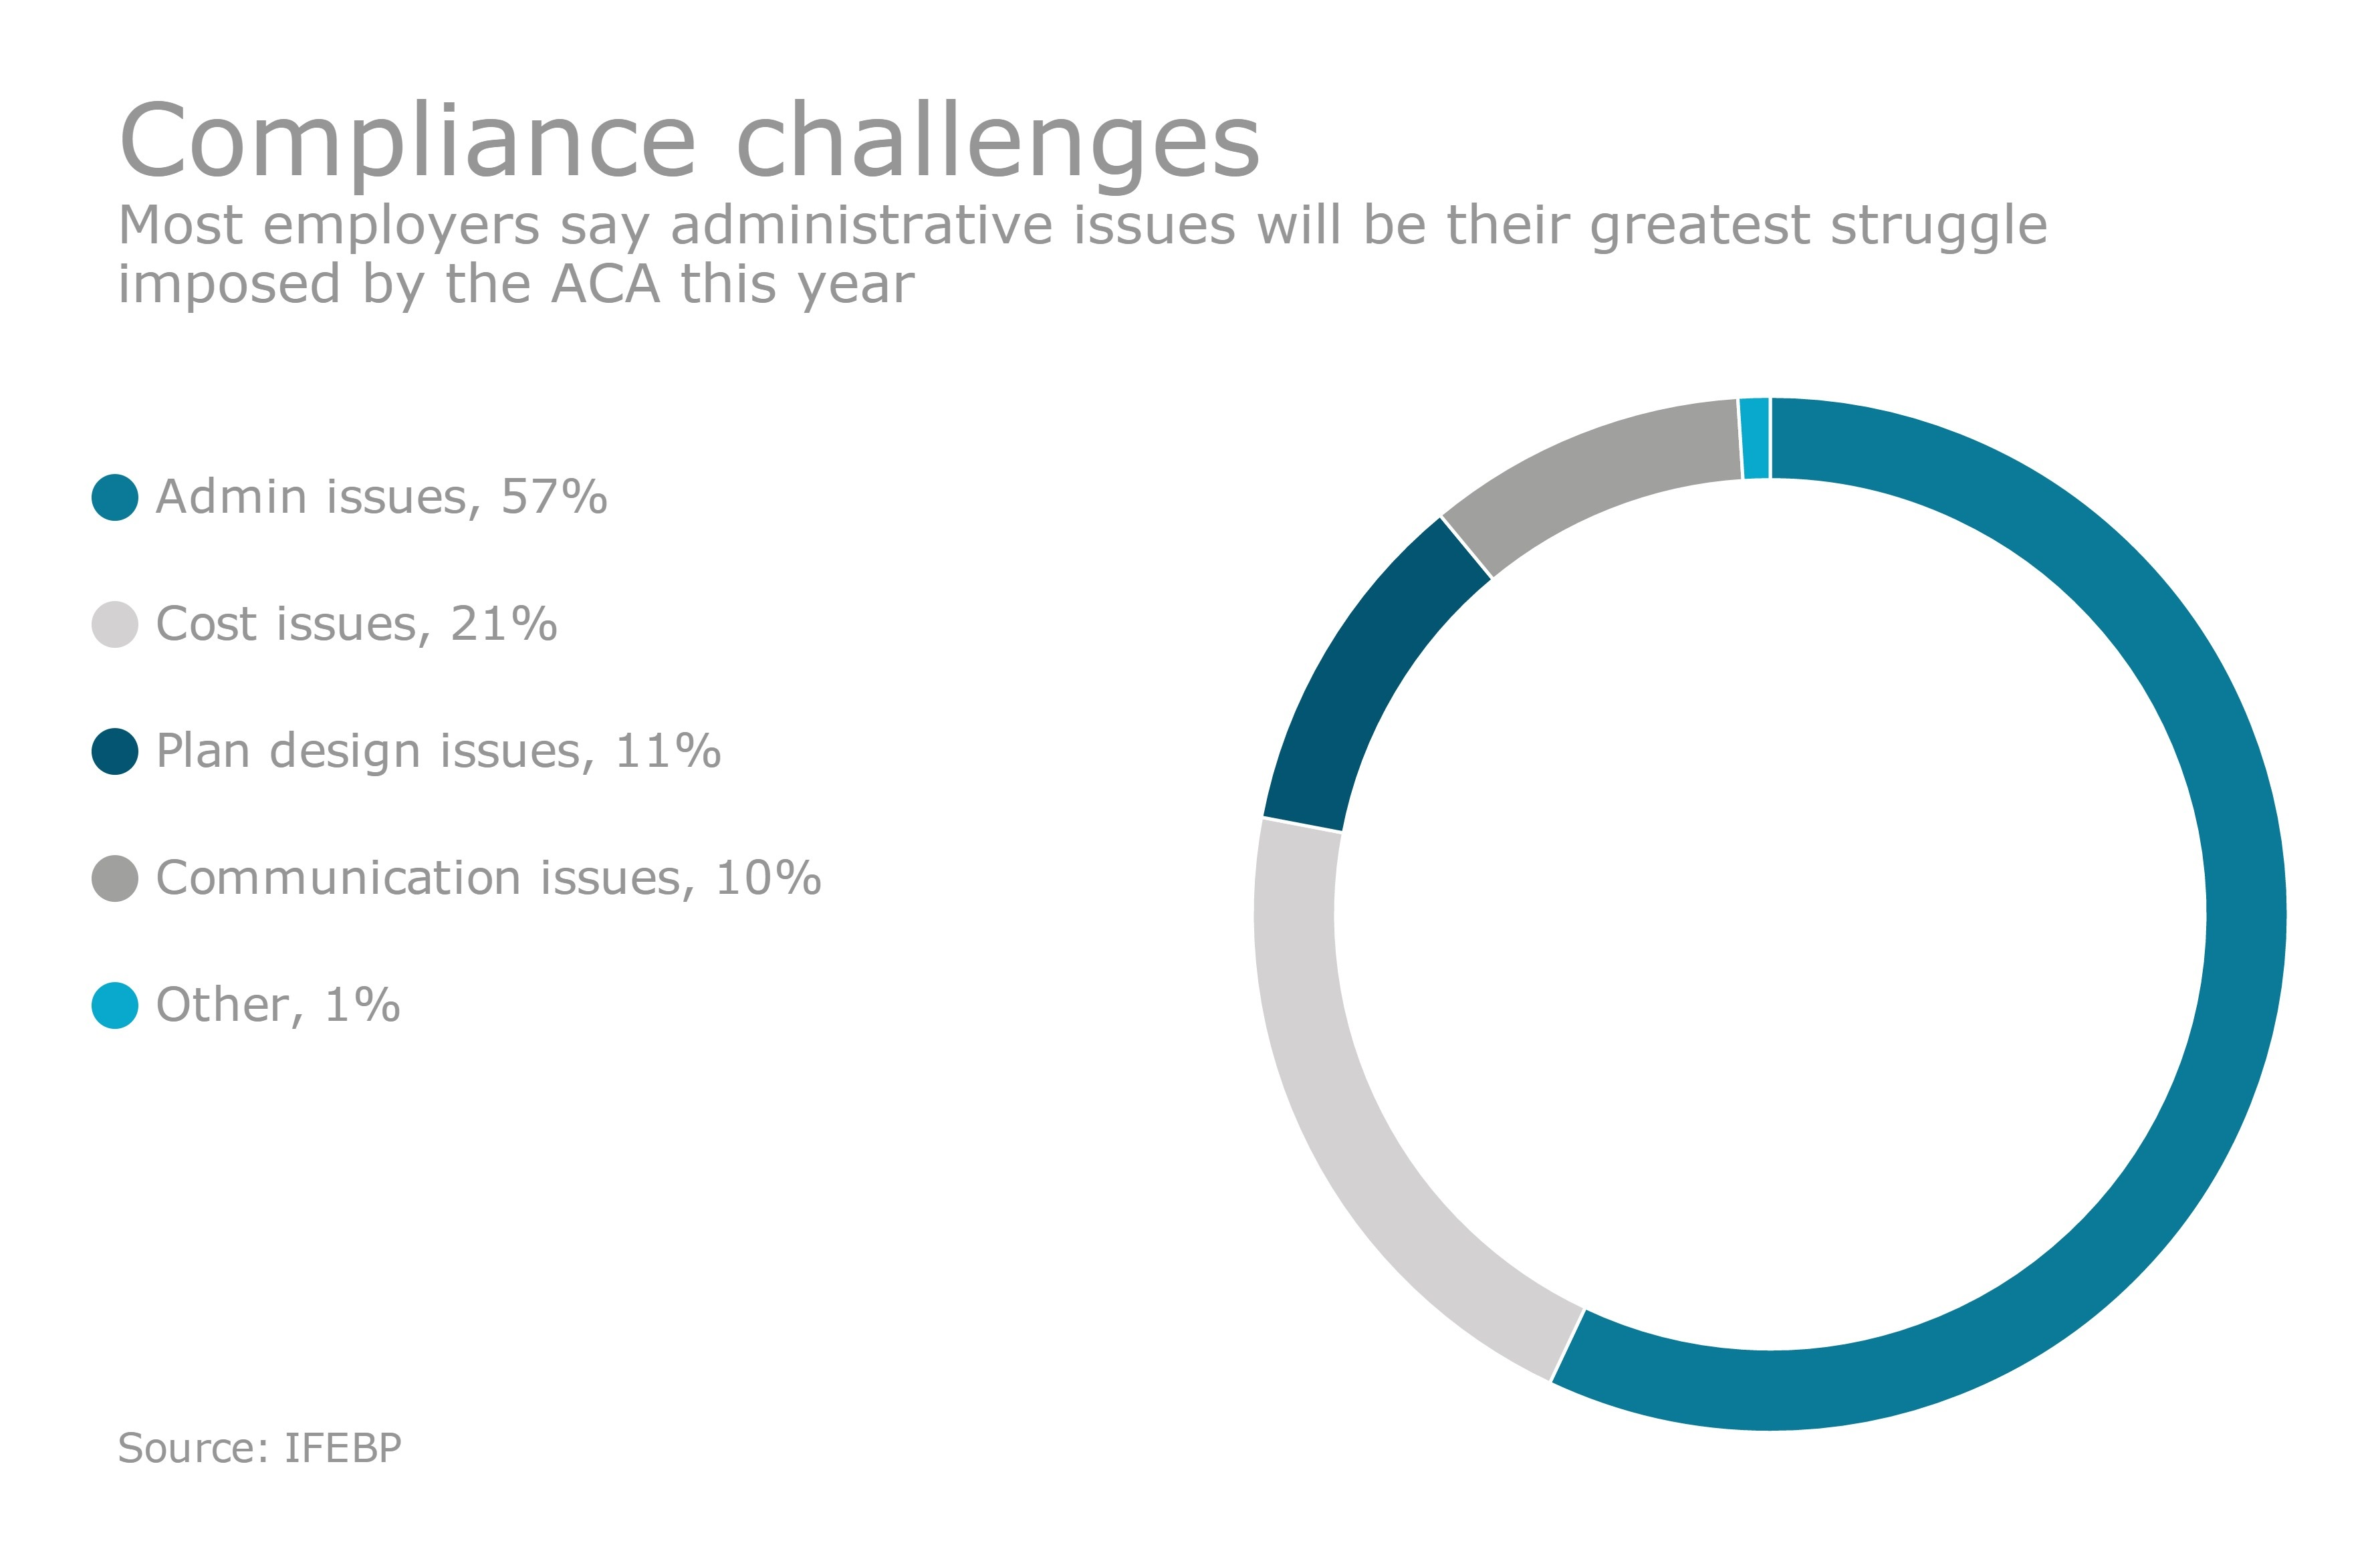 https://assets.sourcemedia.com/6c/04/ec6c8a8b49499a0a2f0d90099ed9/p1-eba-aca-challenges-chart.jpg